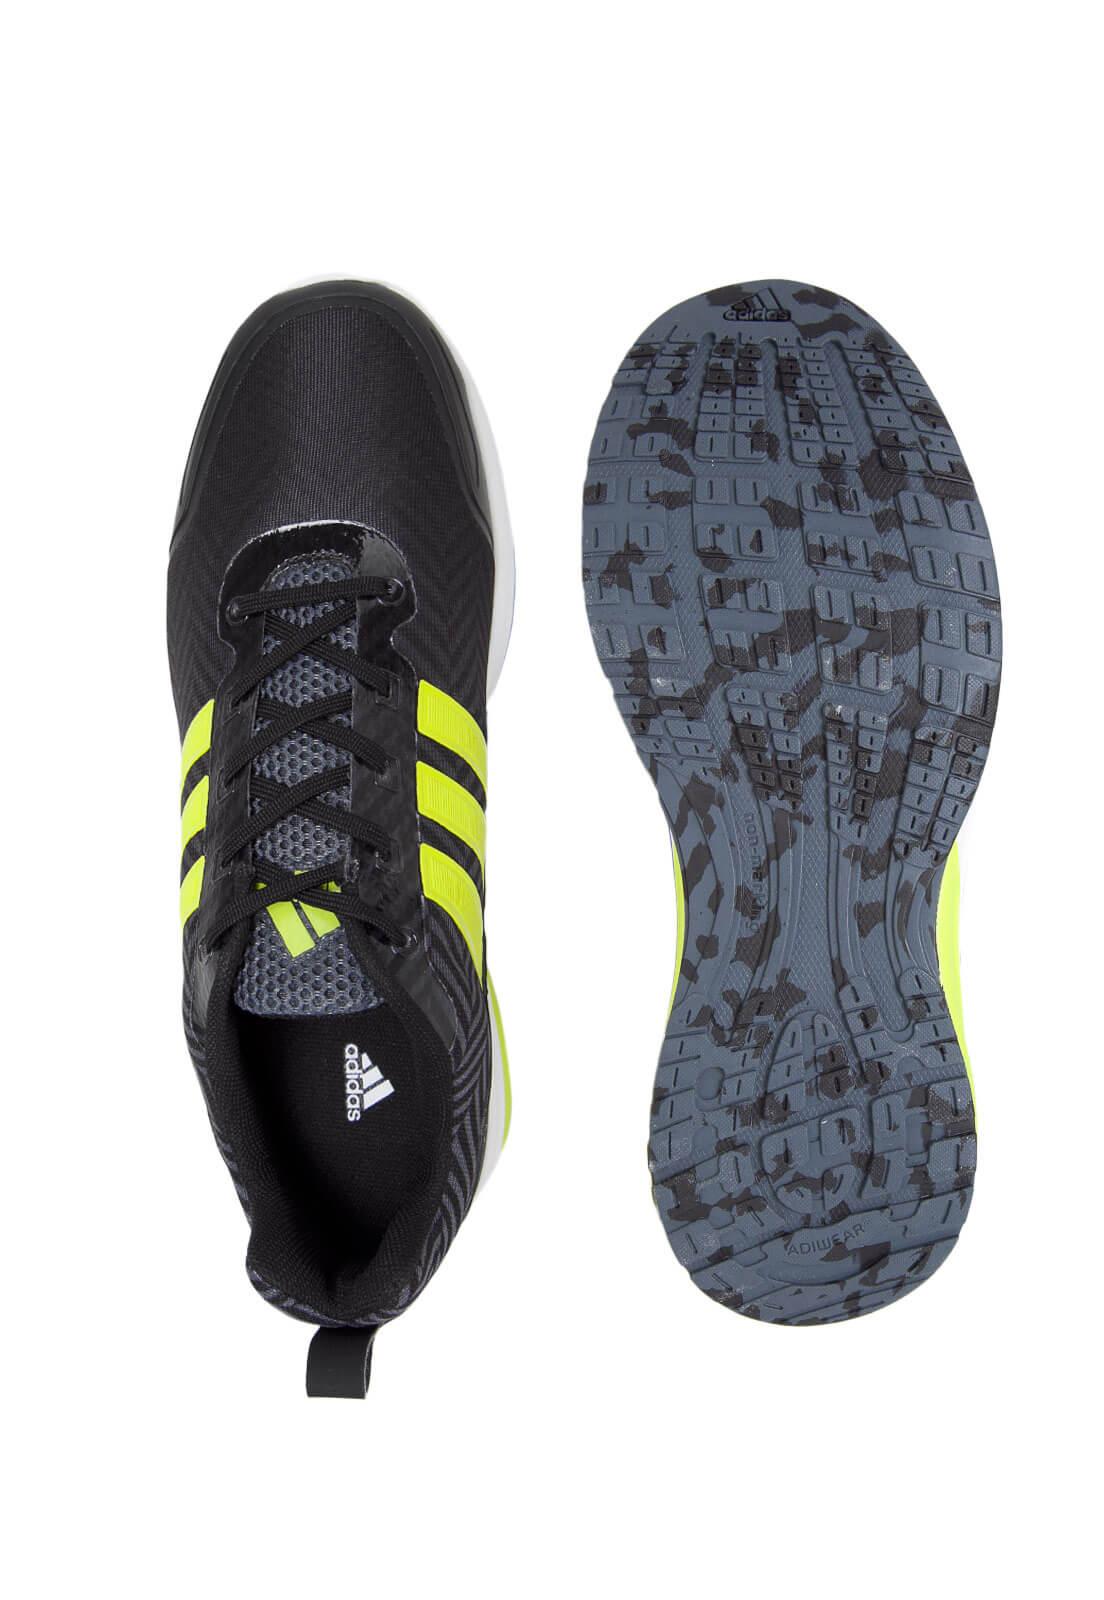 8fd970b1c52 Tênis Masculino Adidas Skyrocket m - BRACIA SHOP  Loja de Roupas ...